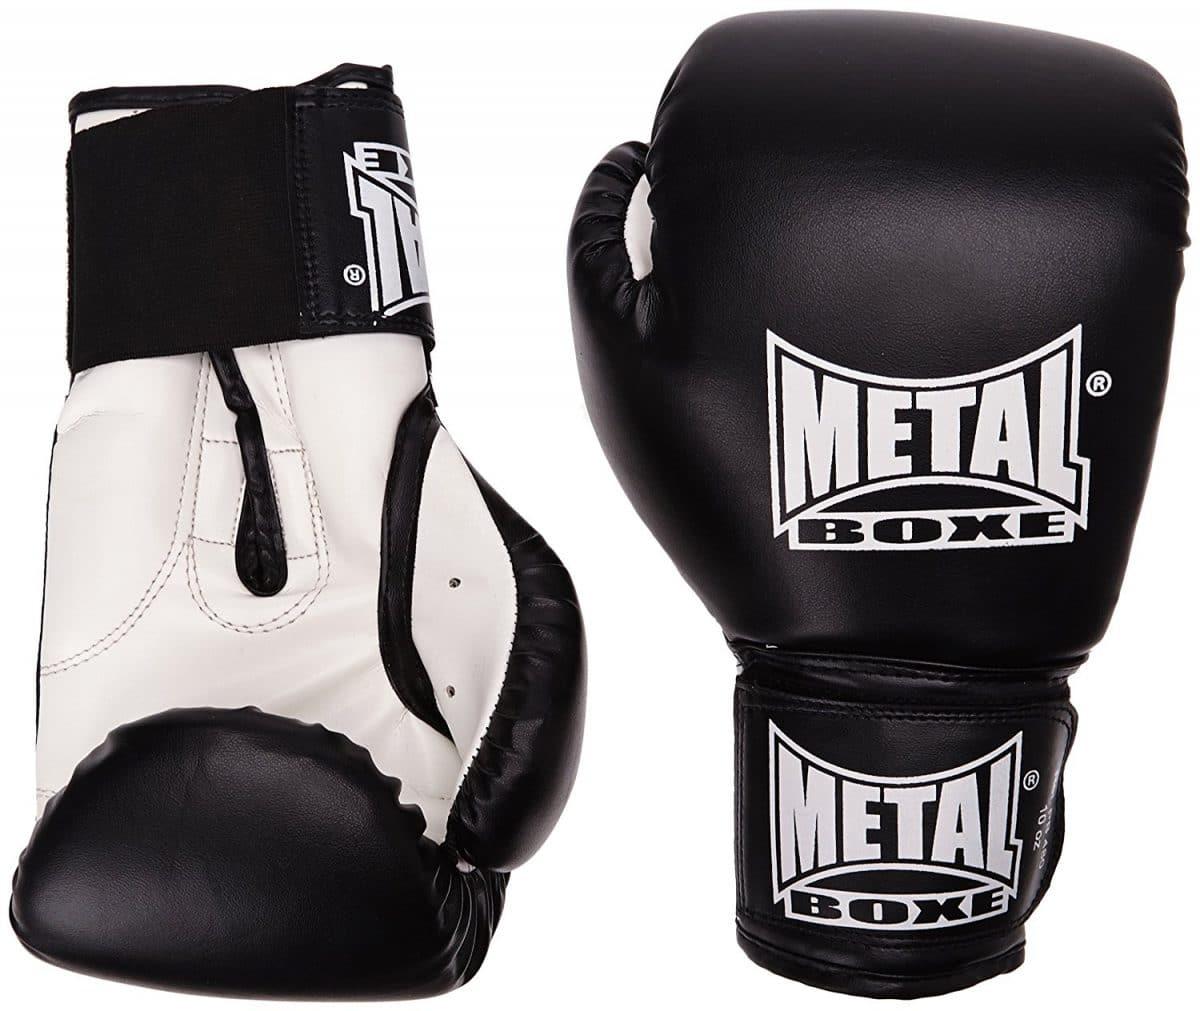 Gants de boxe Metal Boxe